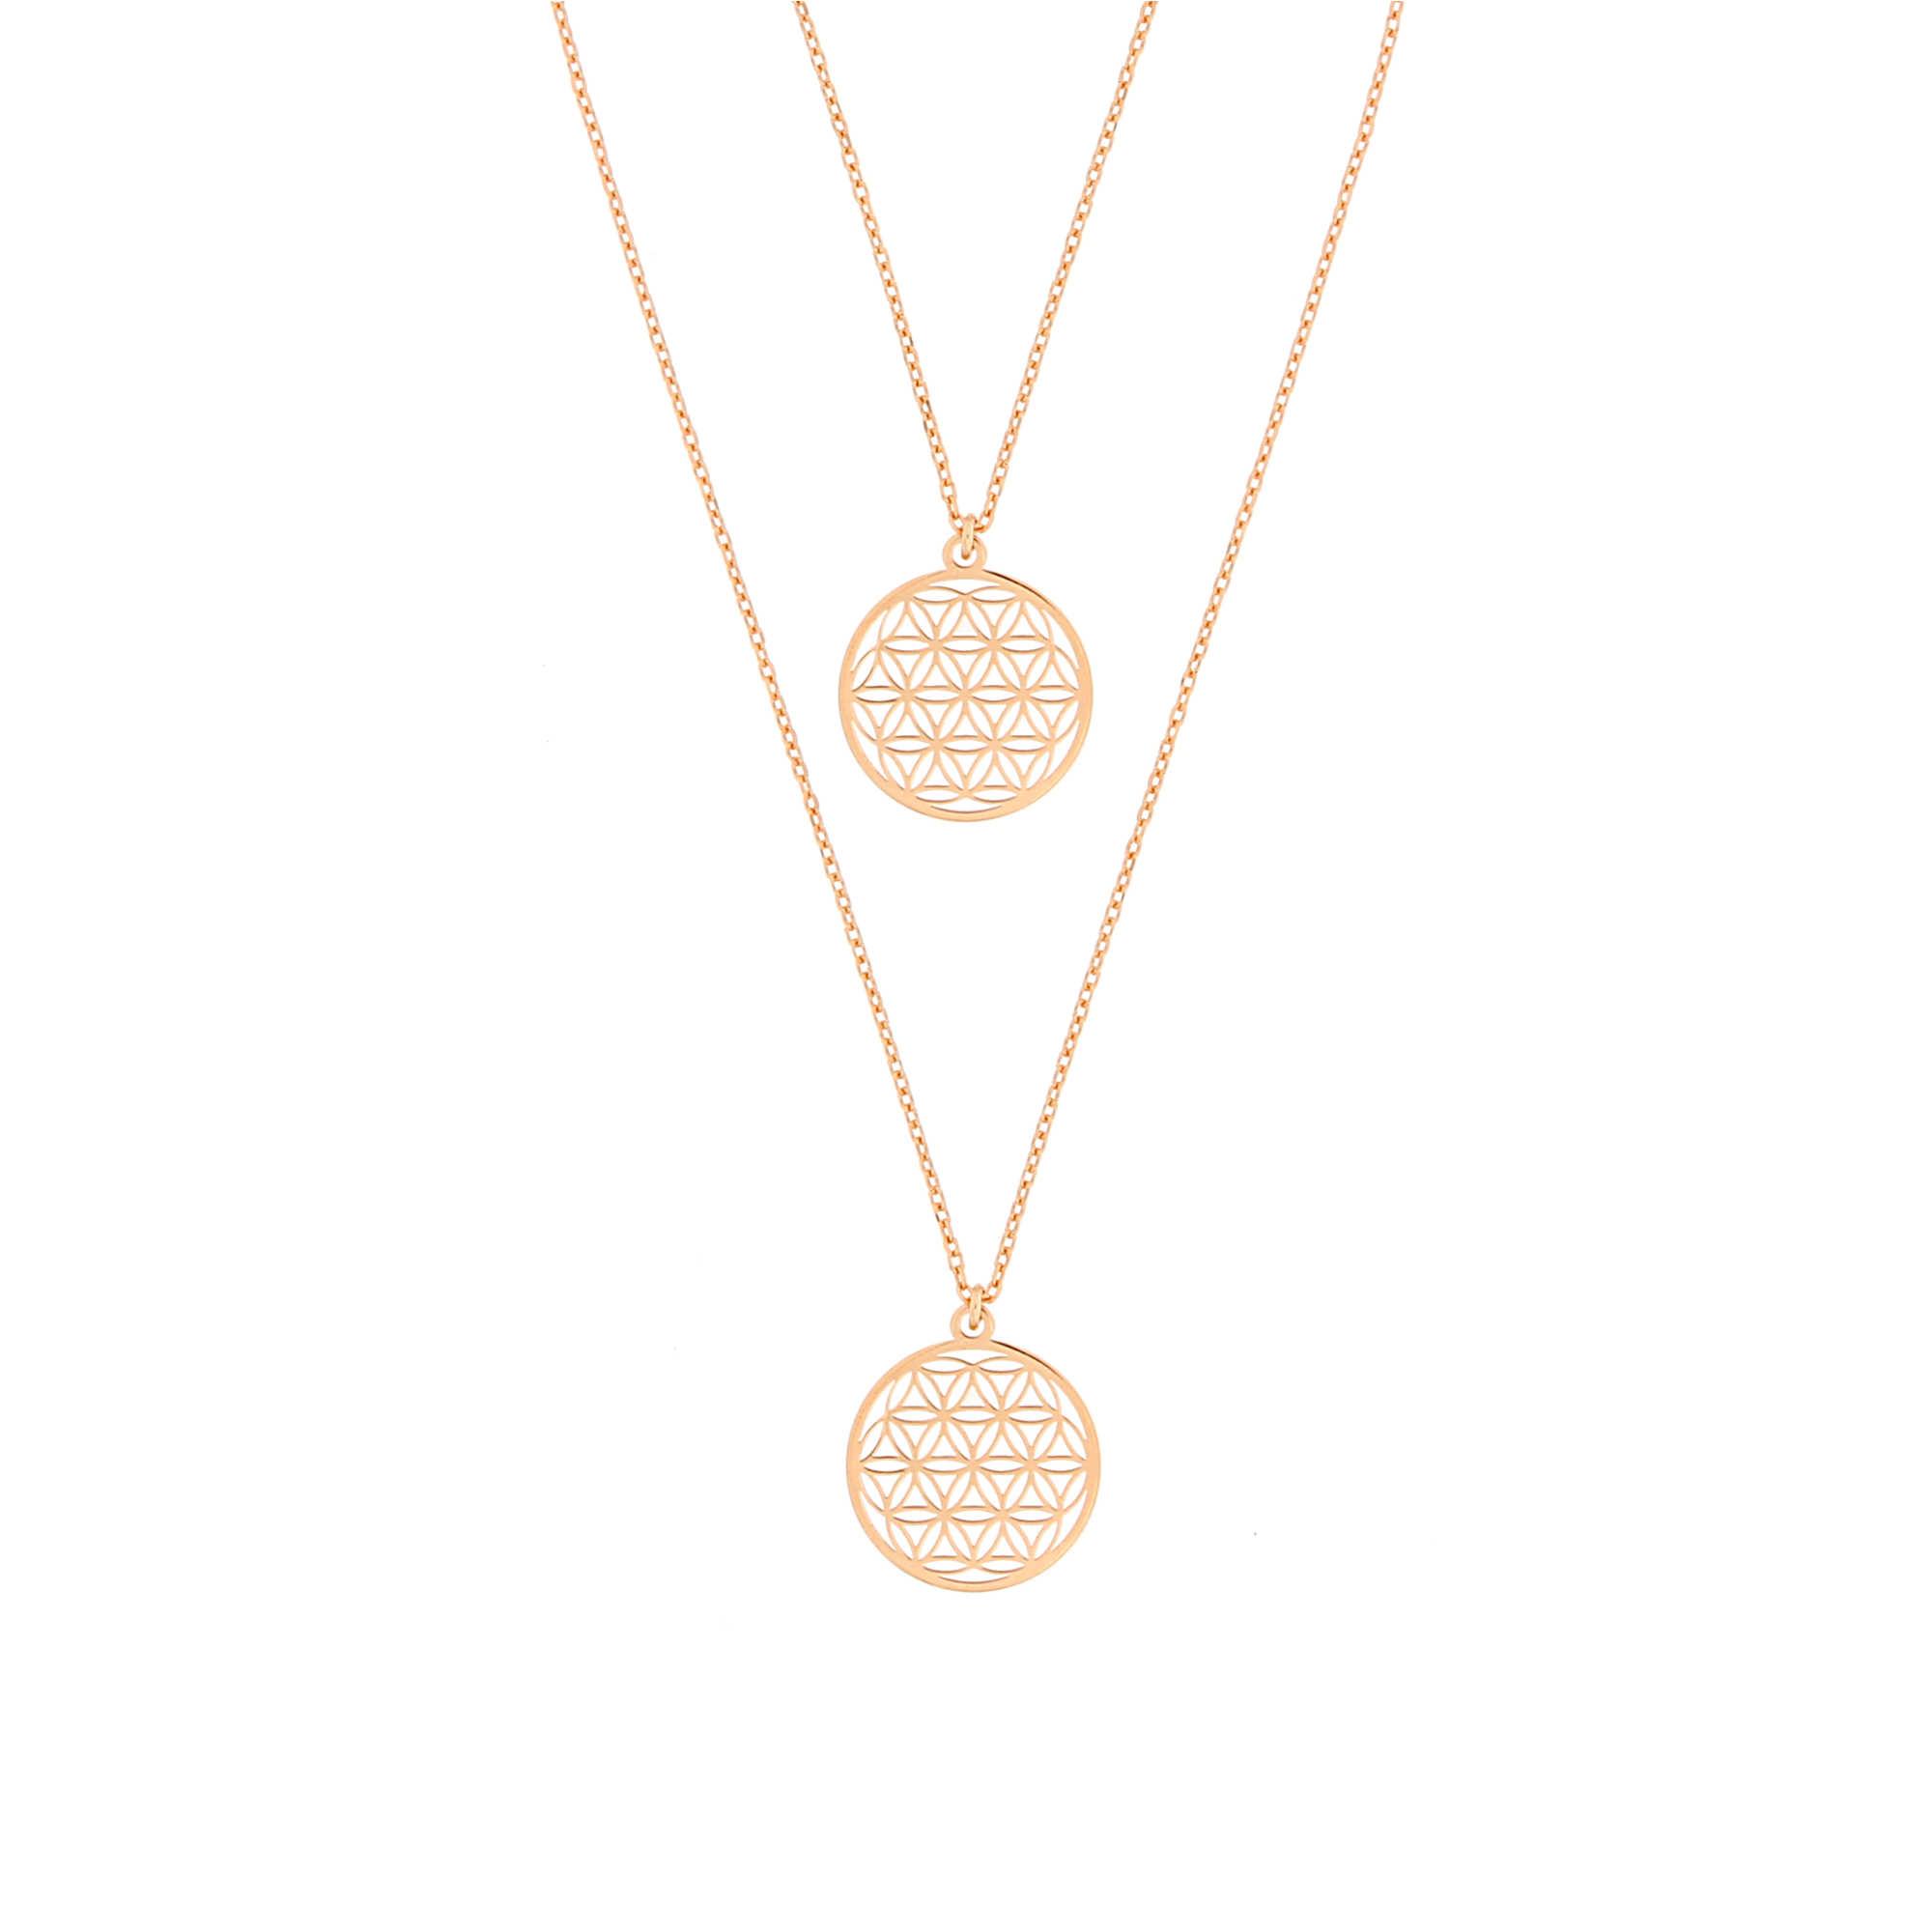 Mutter Tochter Lebensblume Halsketten Set 925 Silber vergoldet ø 15 mm | Schmuck Blume des Lebens Ke